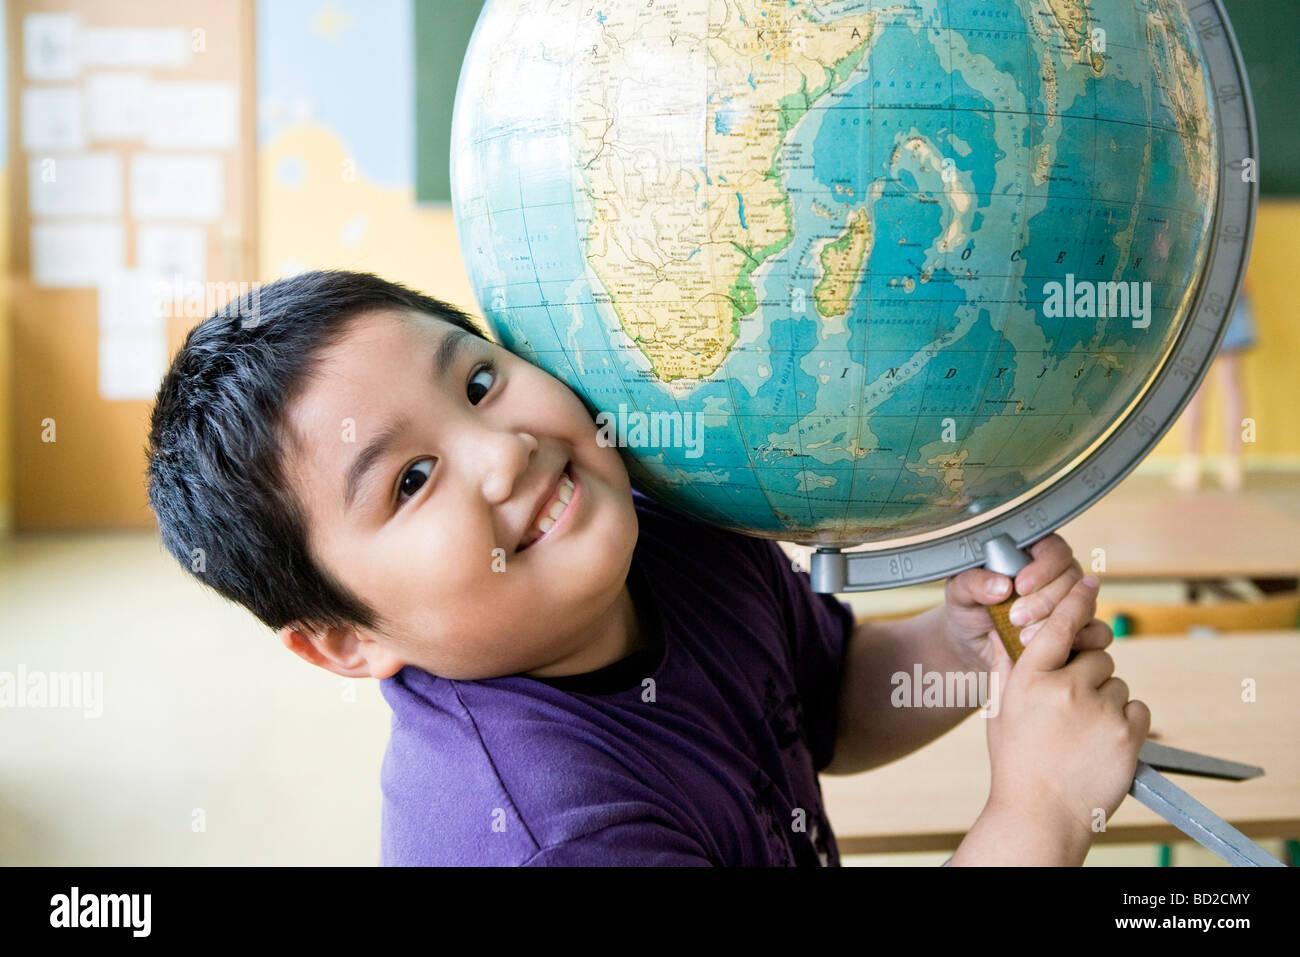 Niño con globo en clase Imagen De Stock